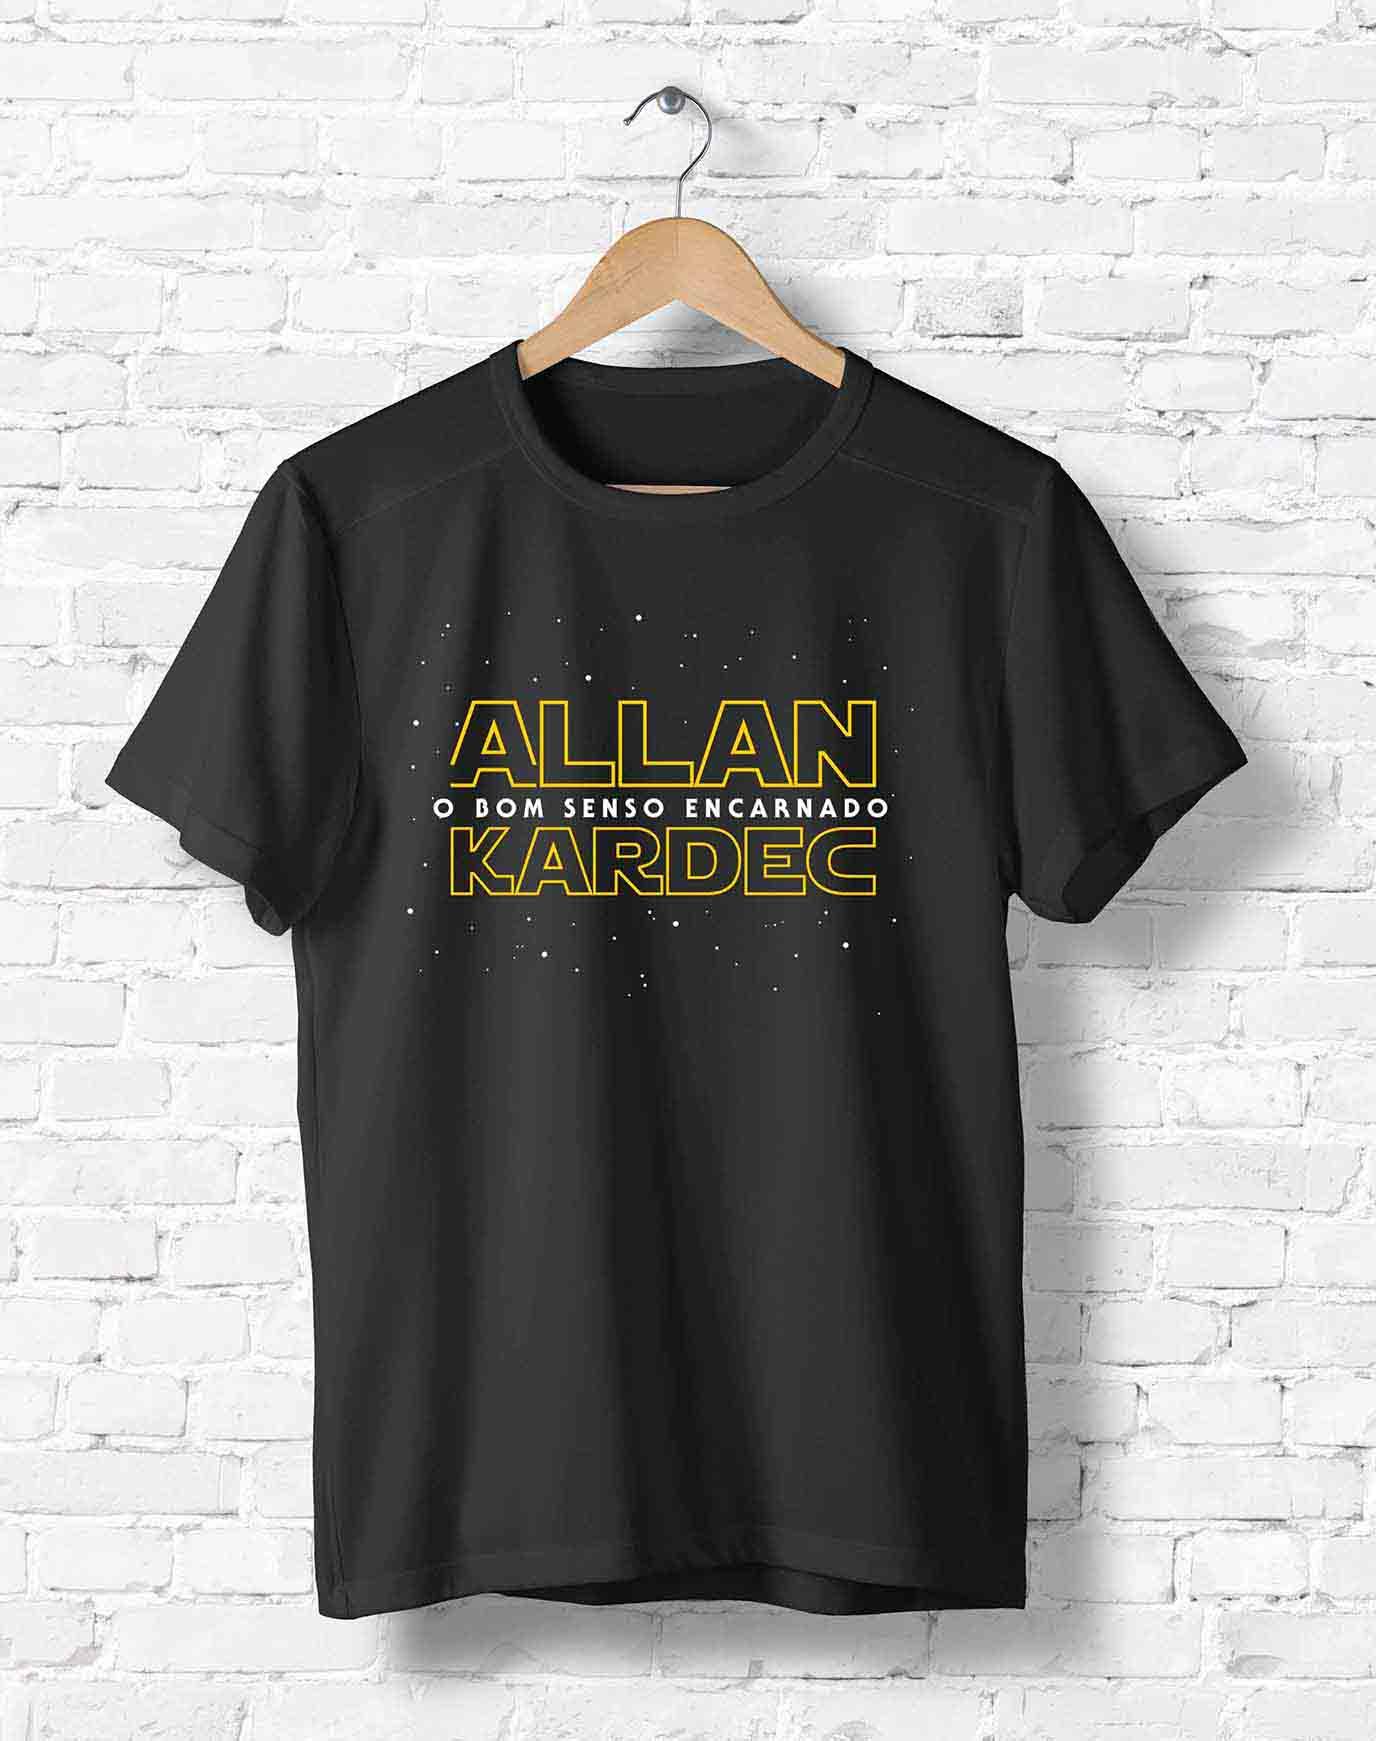 COMBO Allan Kardec - O bom senso encarnado (camiseta + caneca)